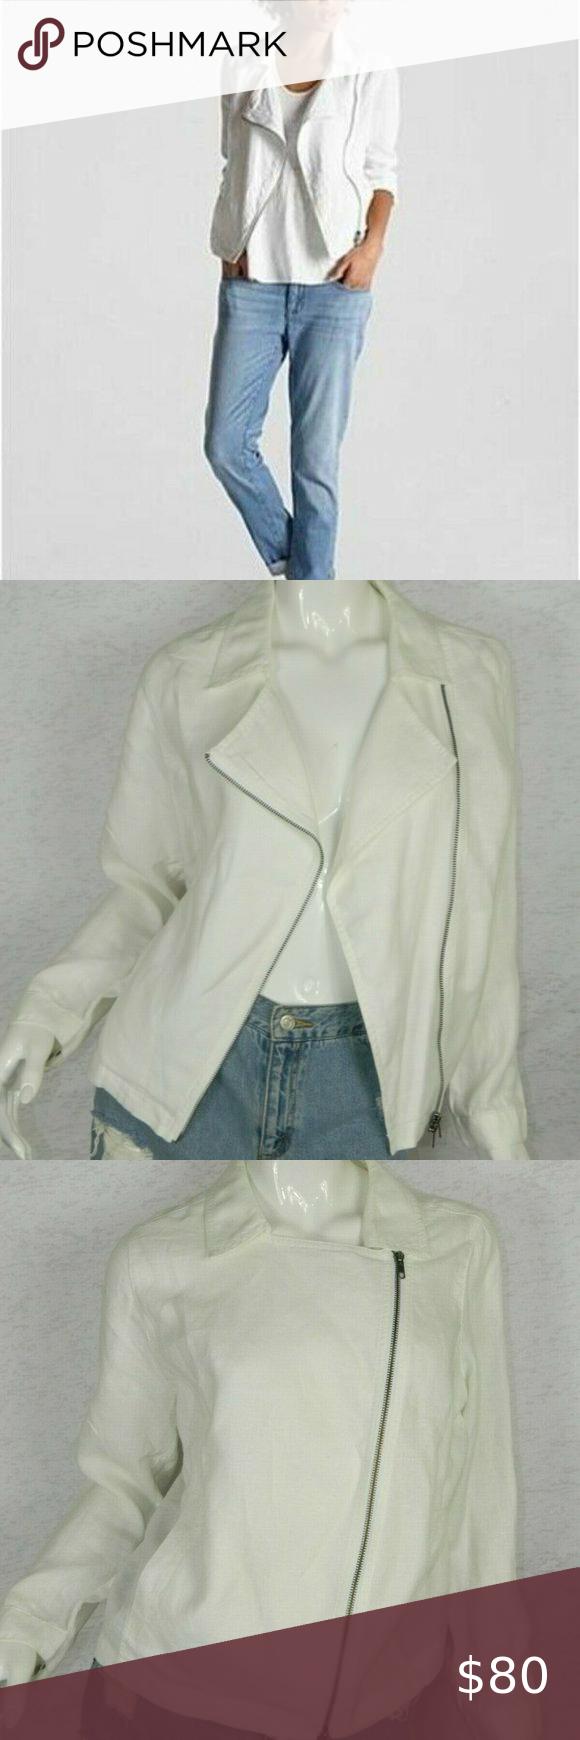 Eileen Fisher Moto Jacket White Linen Medium Eileen Fisher Eileen Fisher Jacket Moto Jacket [ 1740 x 580 Pixel ]